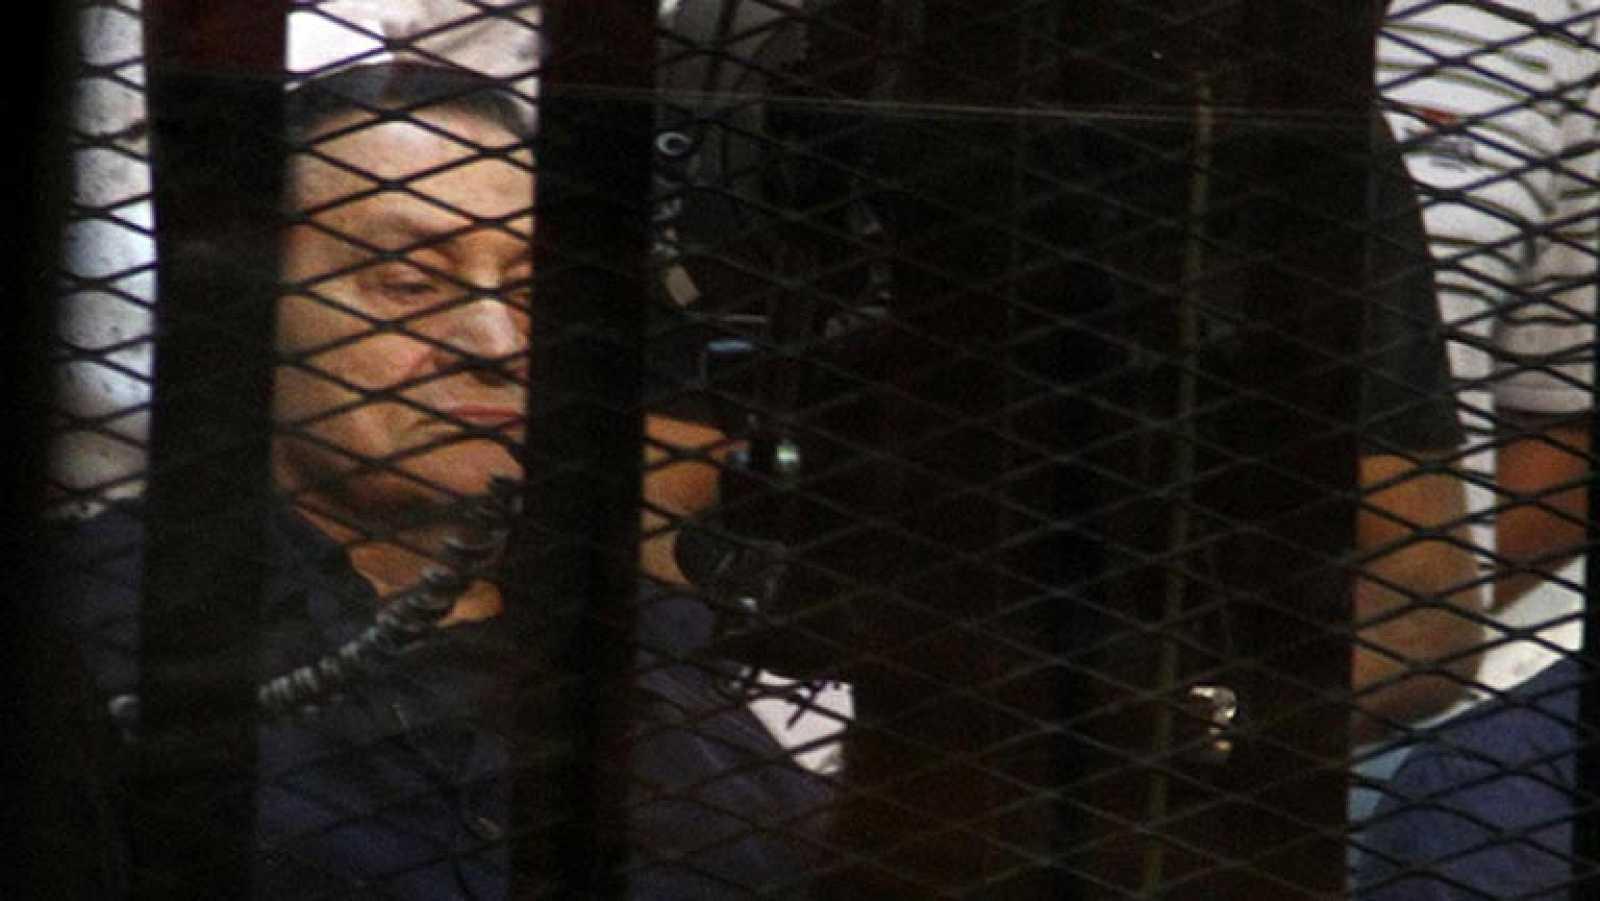 Mubarak declara ante el tribunal que nunca ordenó disparar contra manifestantes